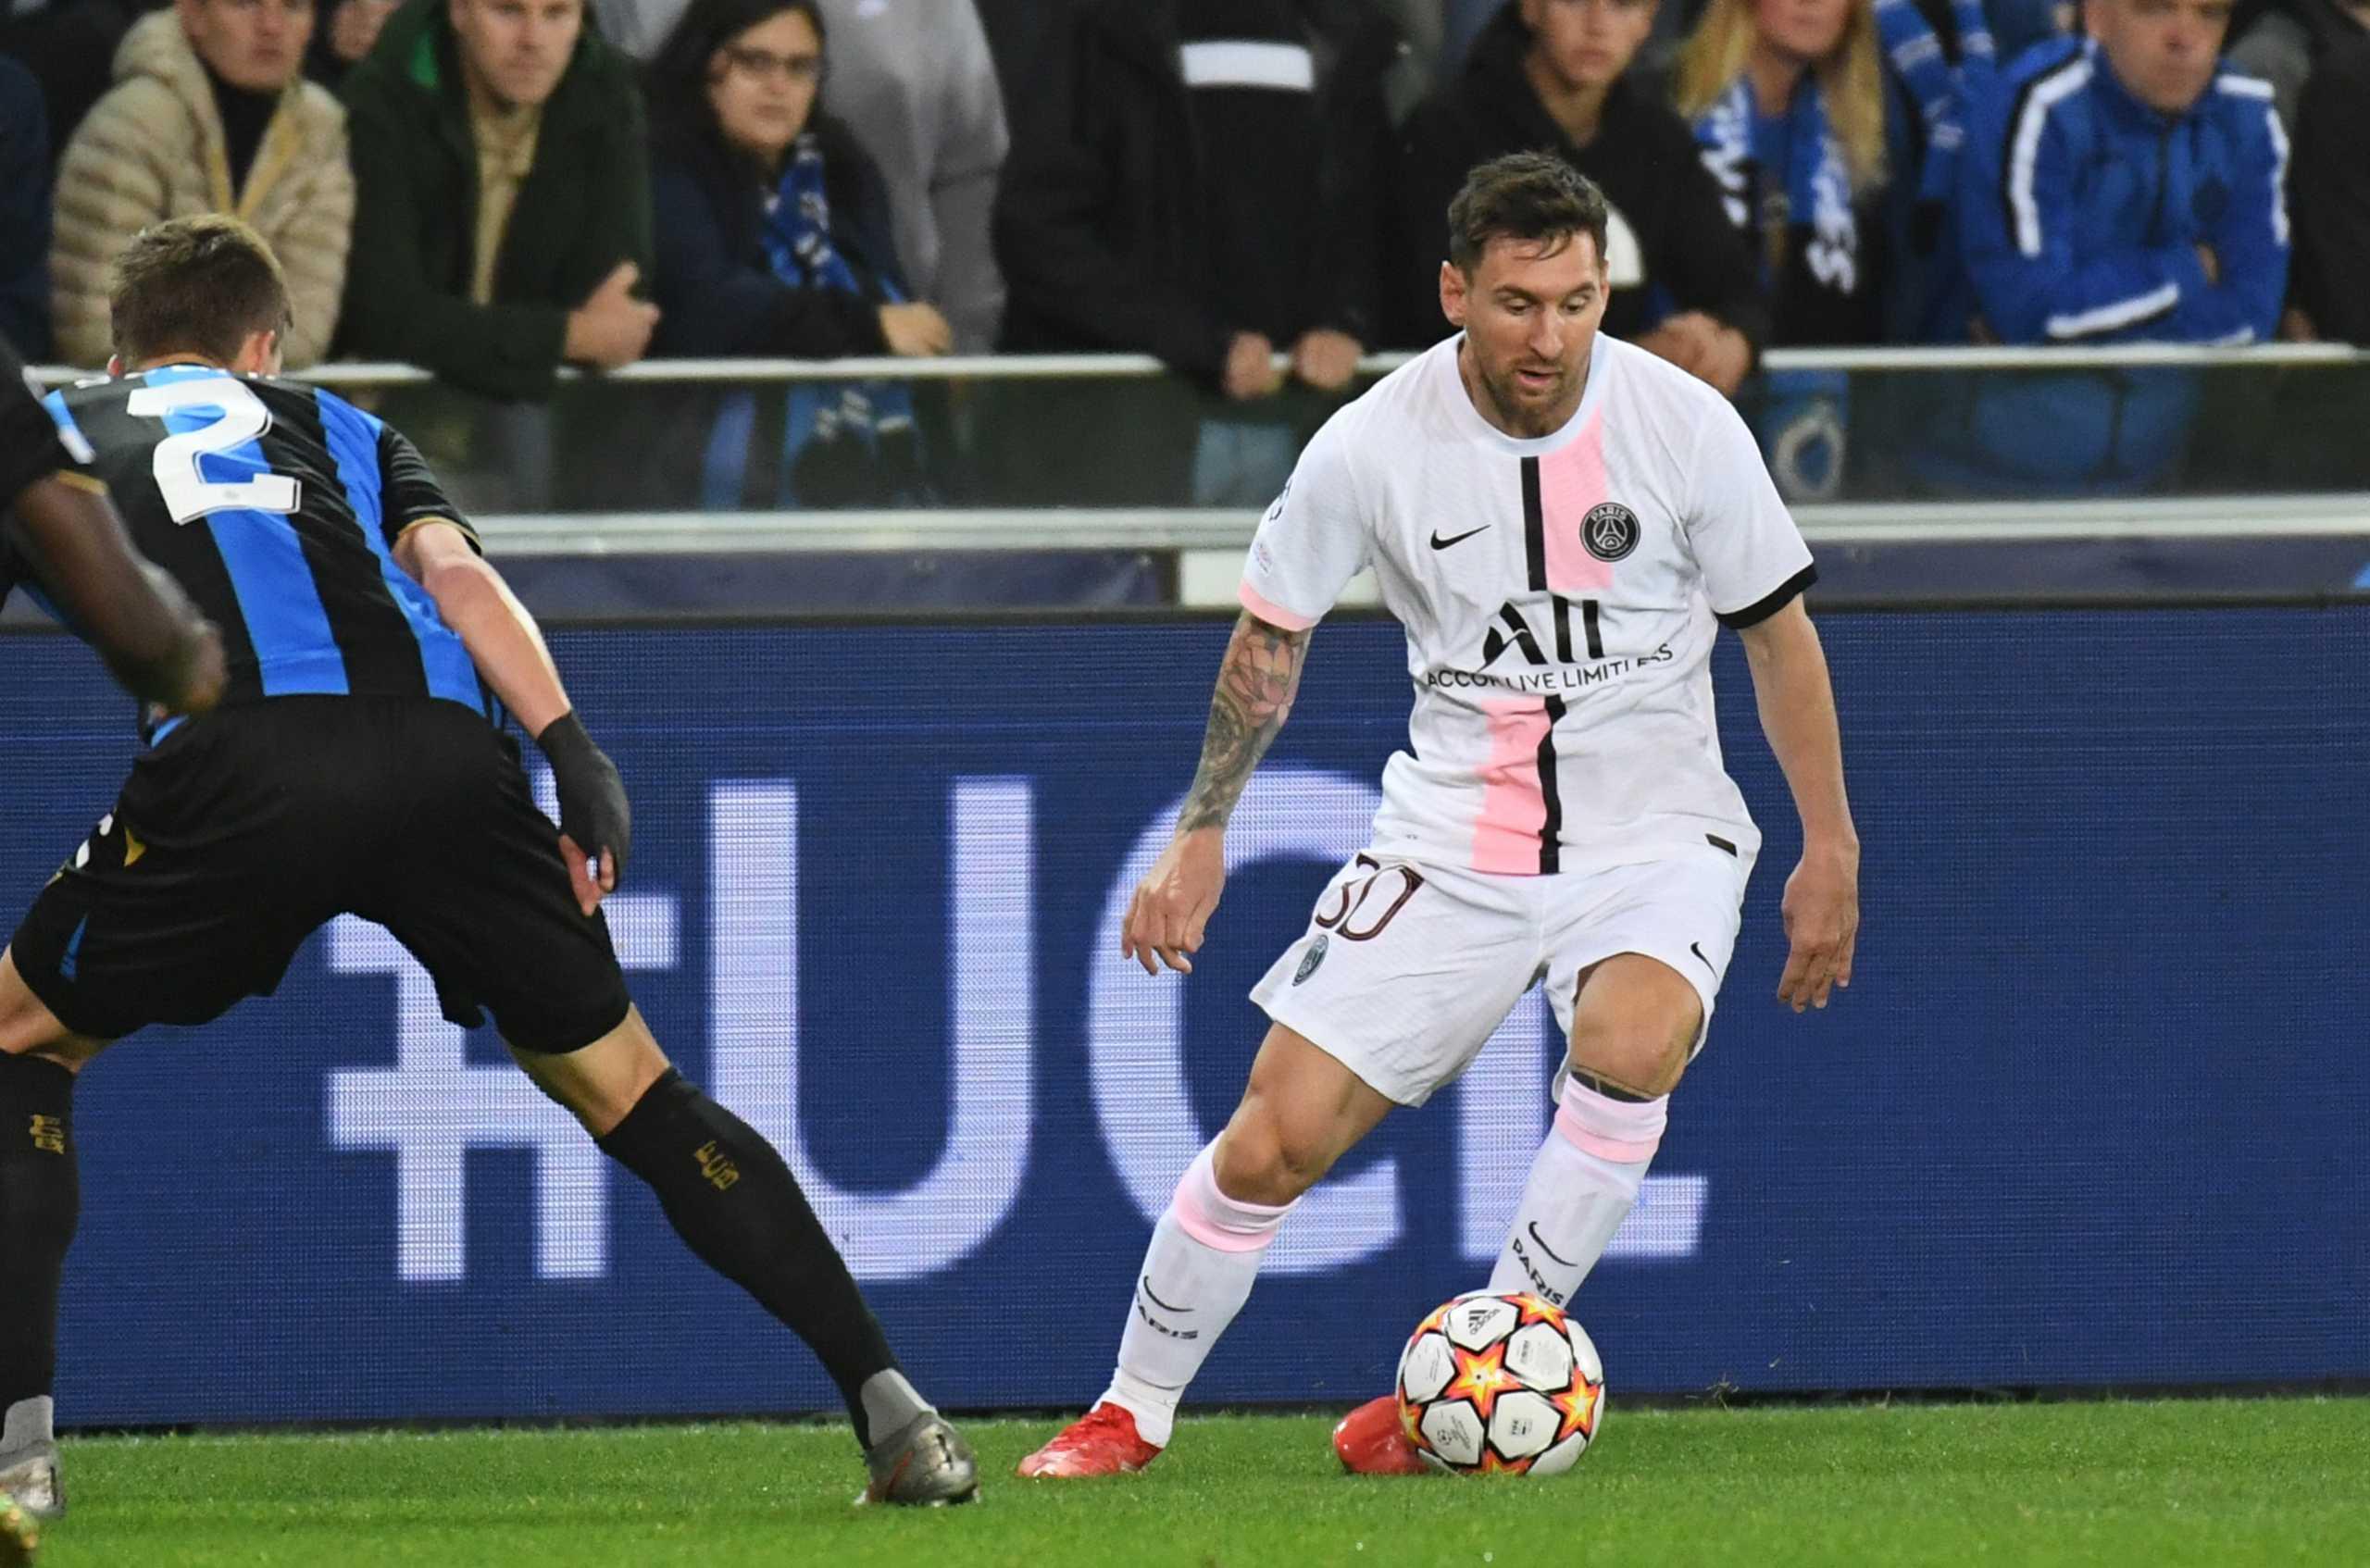 Champions League, Μπριζ – Παρί Σεν Ζερμέν 1-1 και Σίτι – Λειψία 6-3: Χαμός στον πρώτο όμιλο, «γκέλαρε» η παρέα του Λιονέλ Μέσι